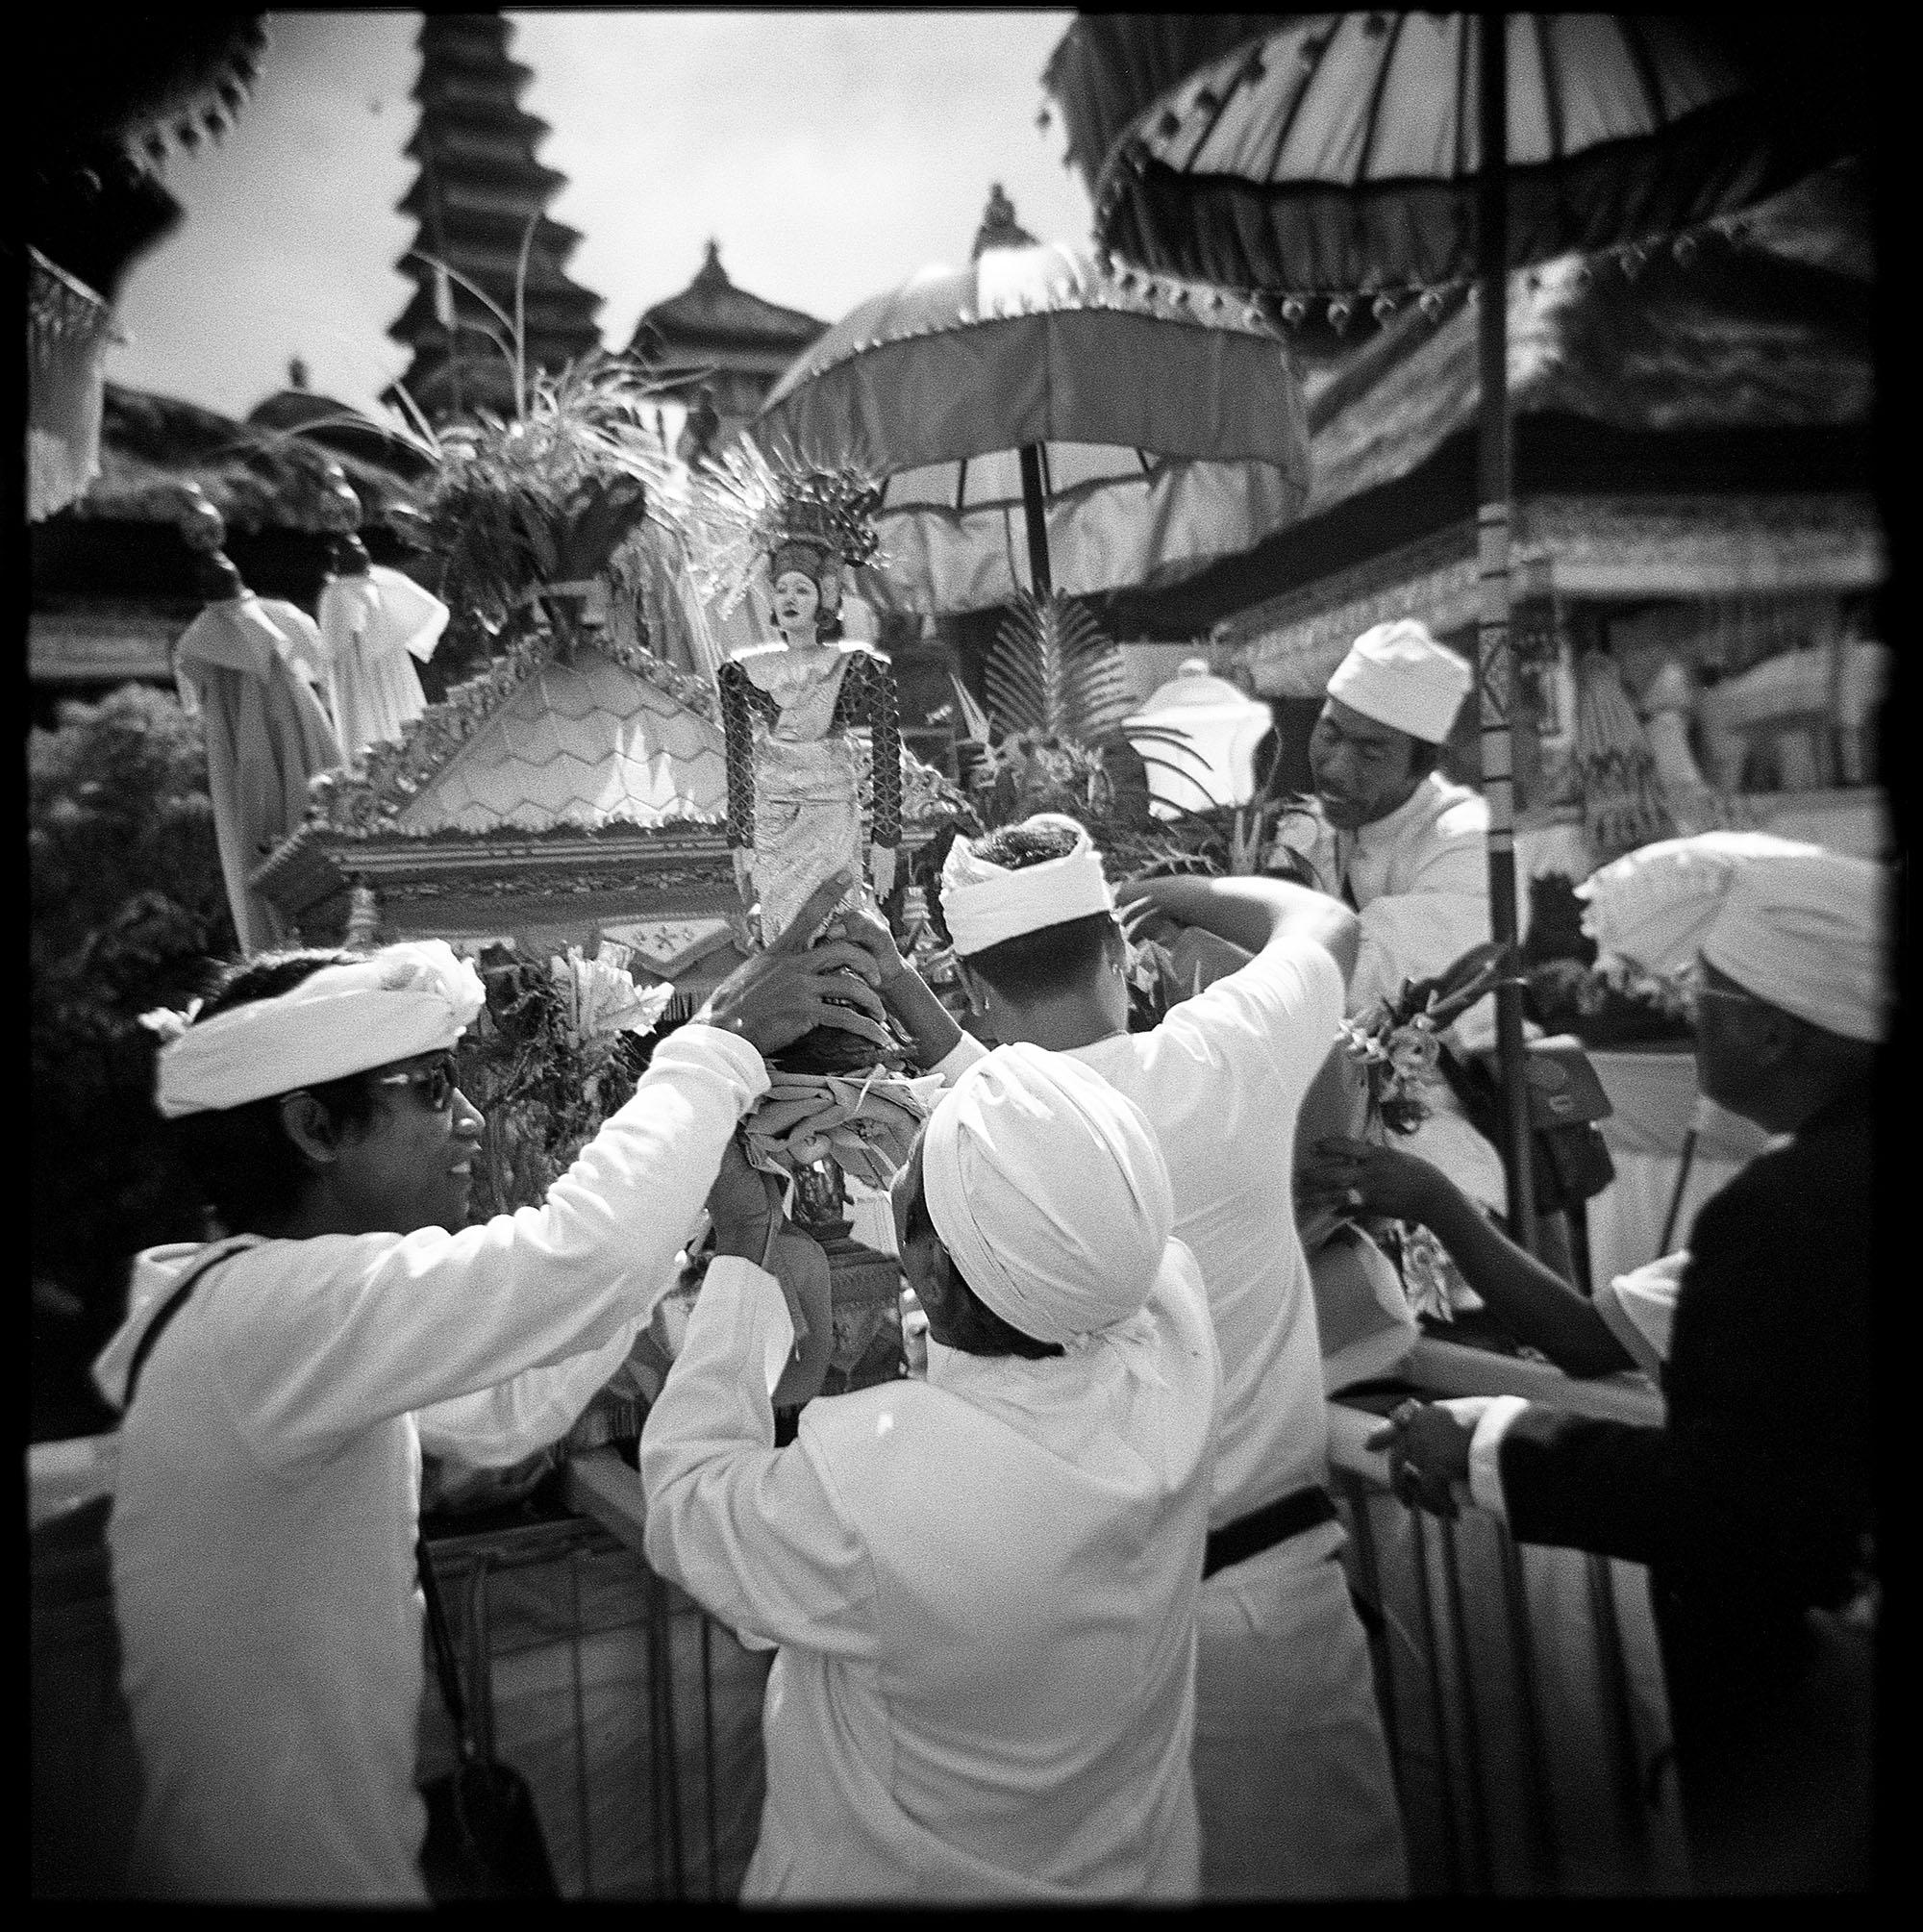 WebSP_methapisic spirituality_AgungParameswara_033.JPG